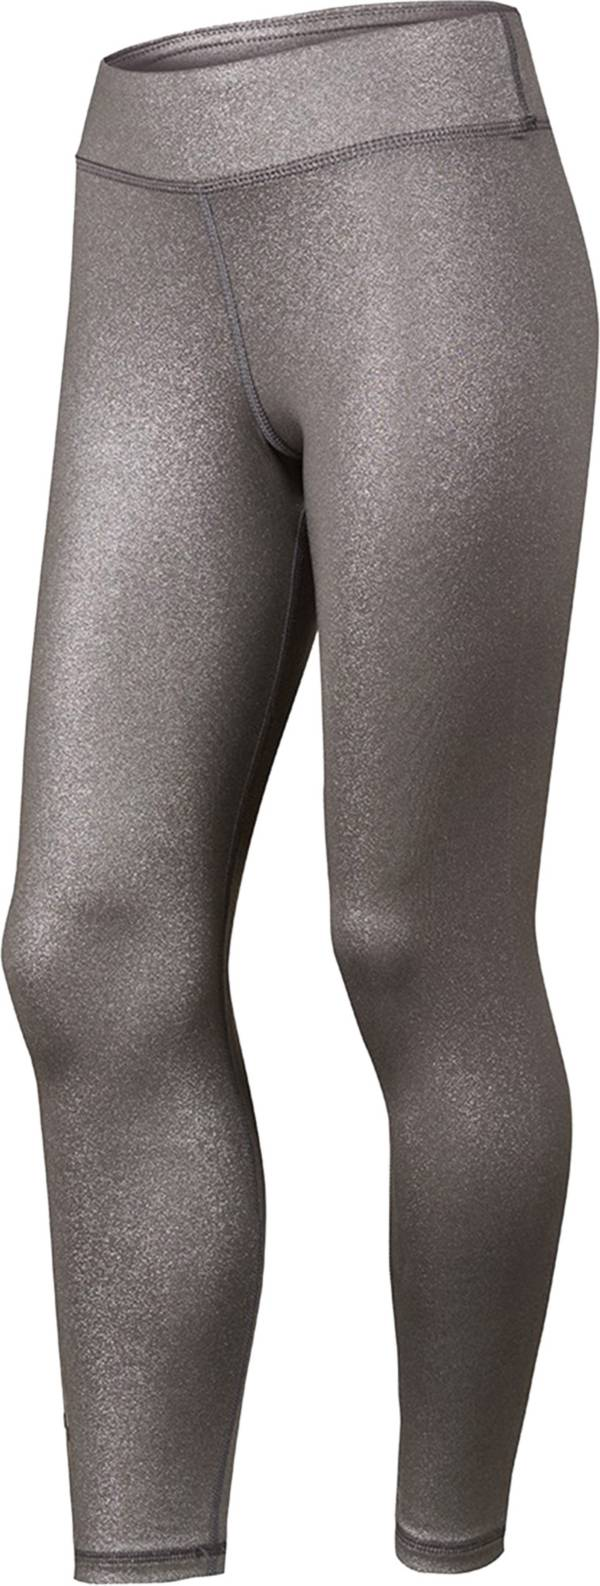 Soffe Girls' Slay Metallic Leggings product image